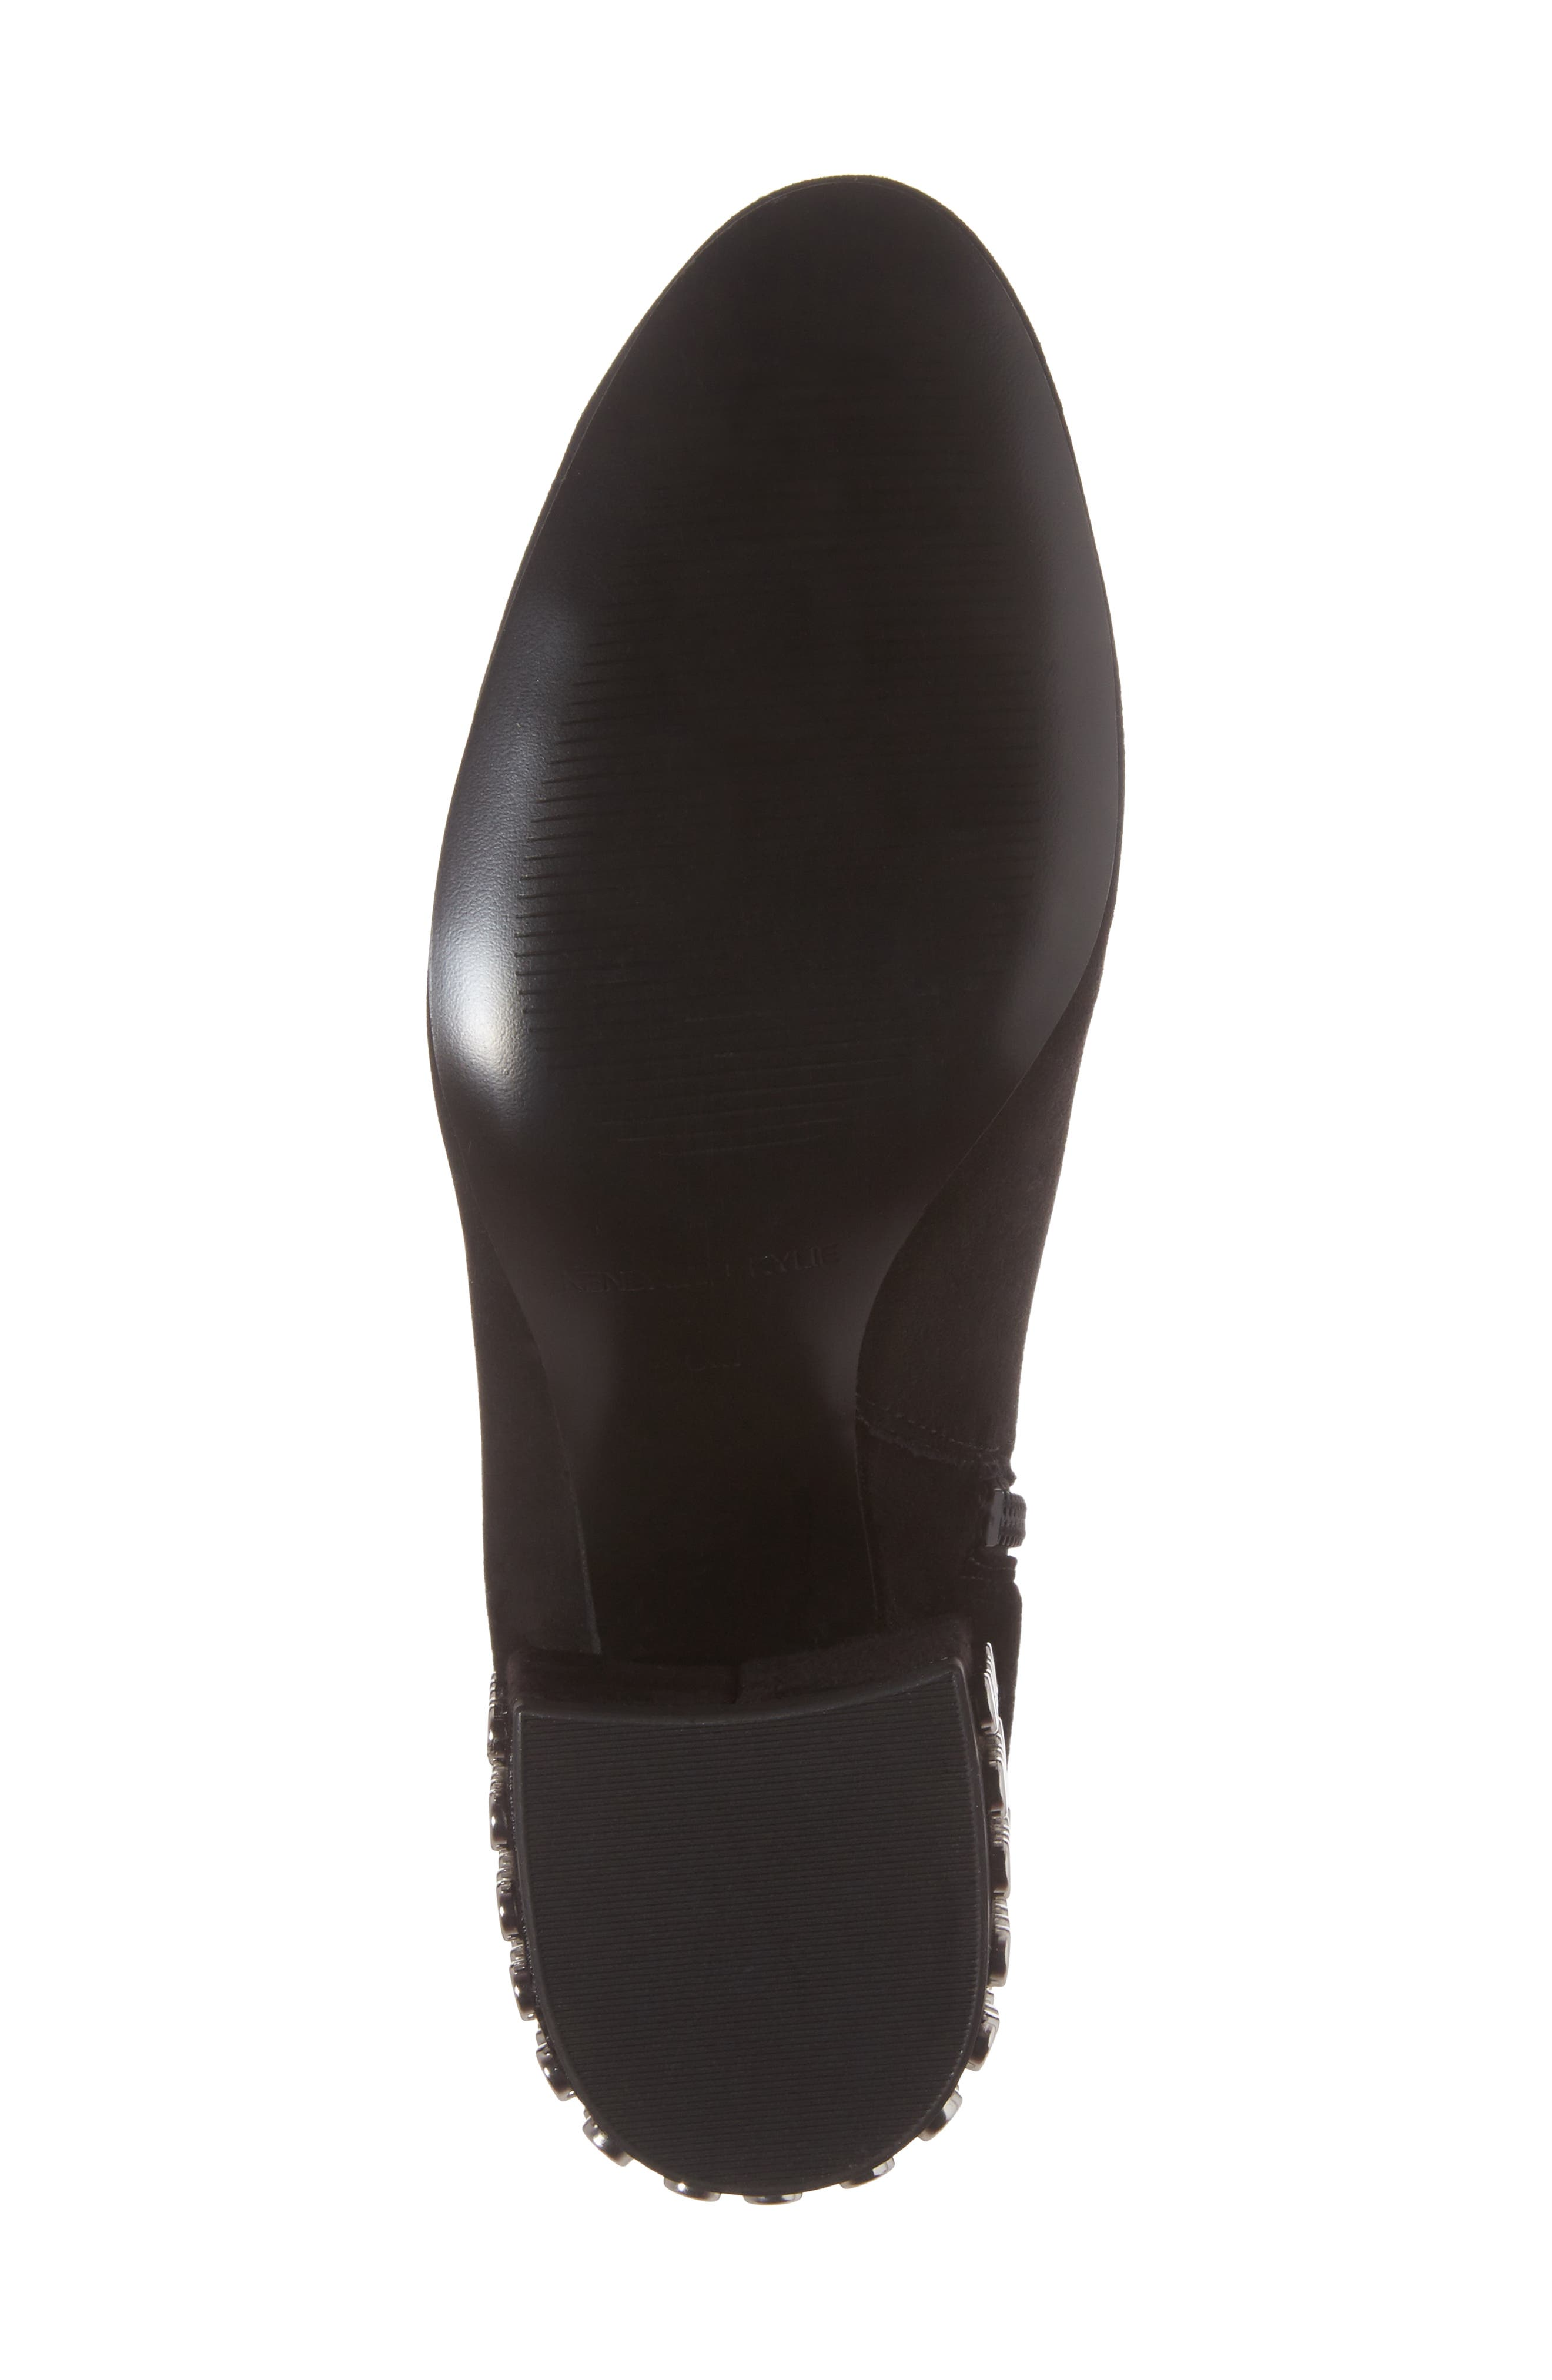 Blythe Studded Heel Bootie,                             Alternate thumbnail 6, color,                             Black Suede